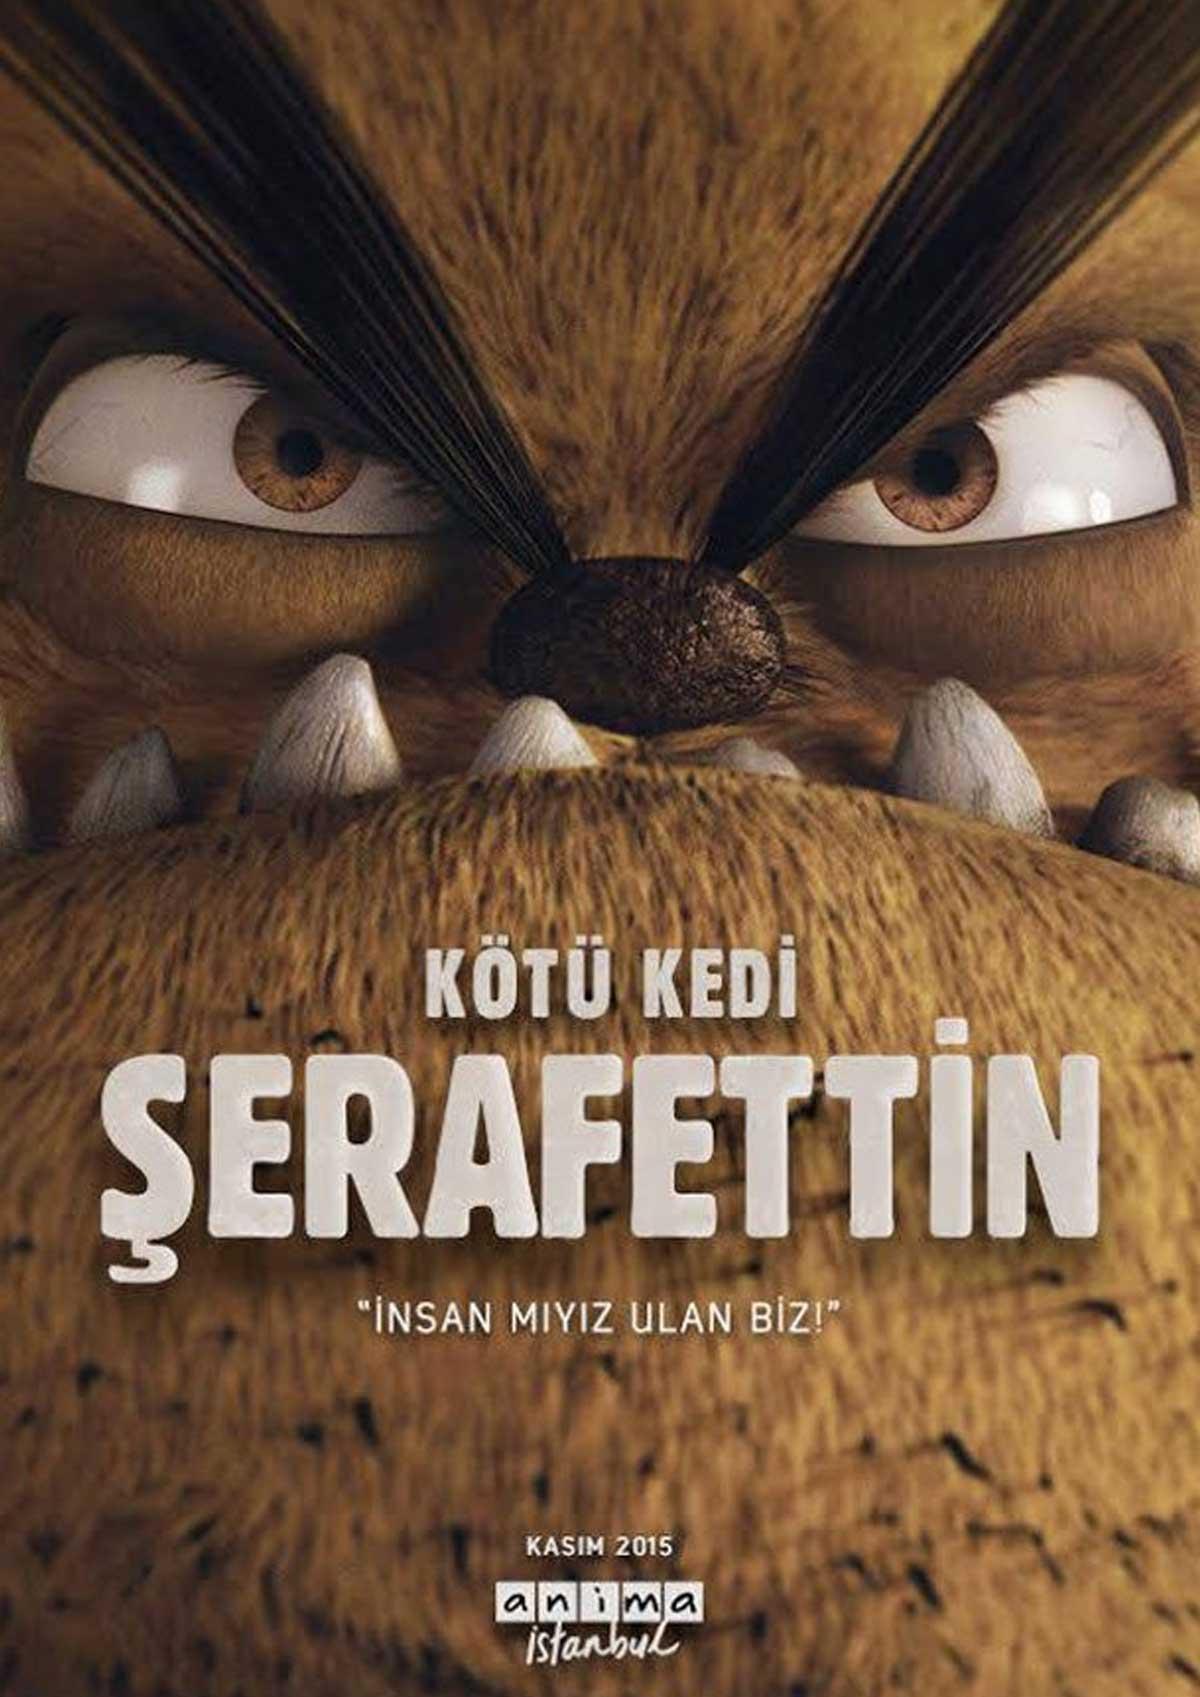 Kötü Kedi Şerafettin film afişi